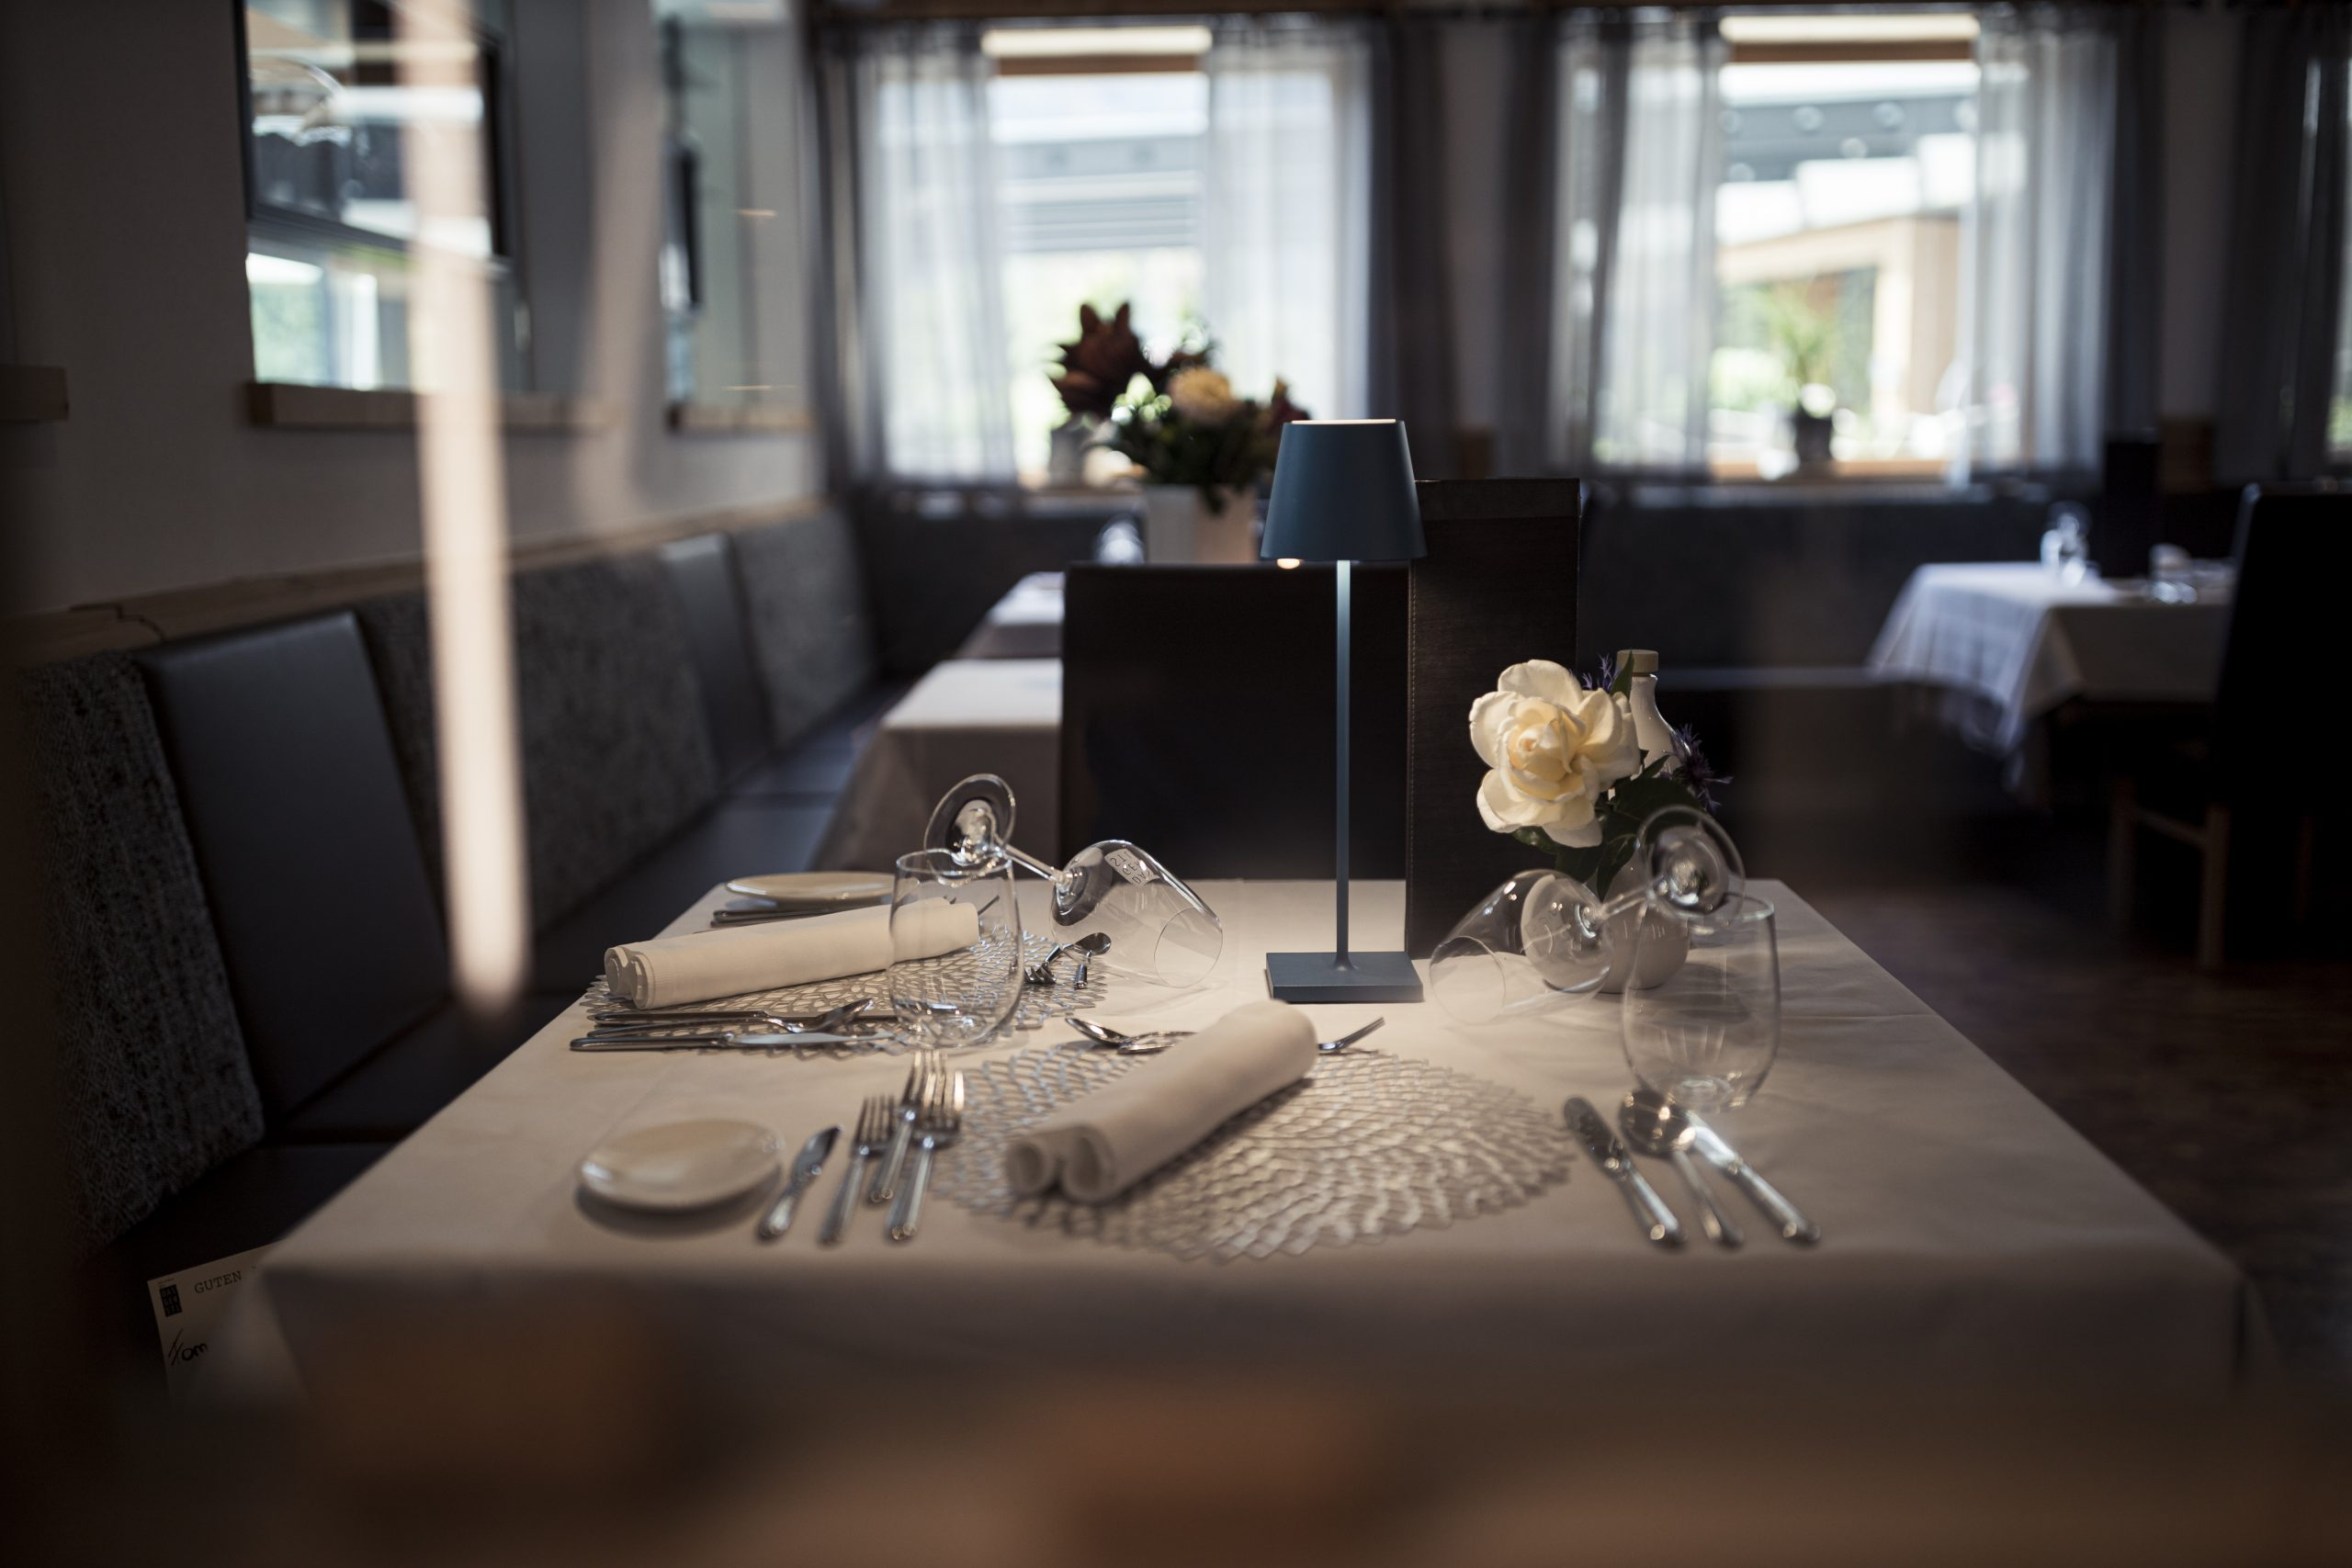 ©ALPIN & RELAX HOTEL DAS GERSTL - MALLES VENOSTA | PROJECT: ARCH. THOMAS PEDERIVA | FOTO: FLORIAN ANDERGASSEN